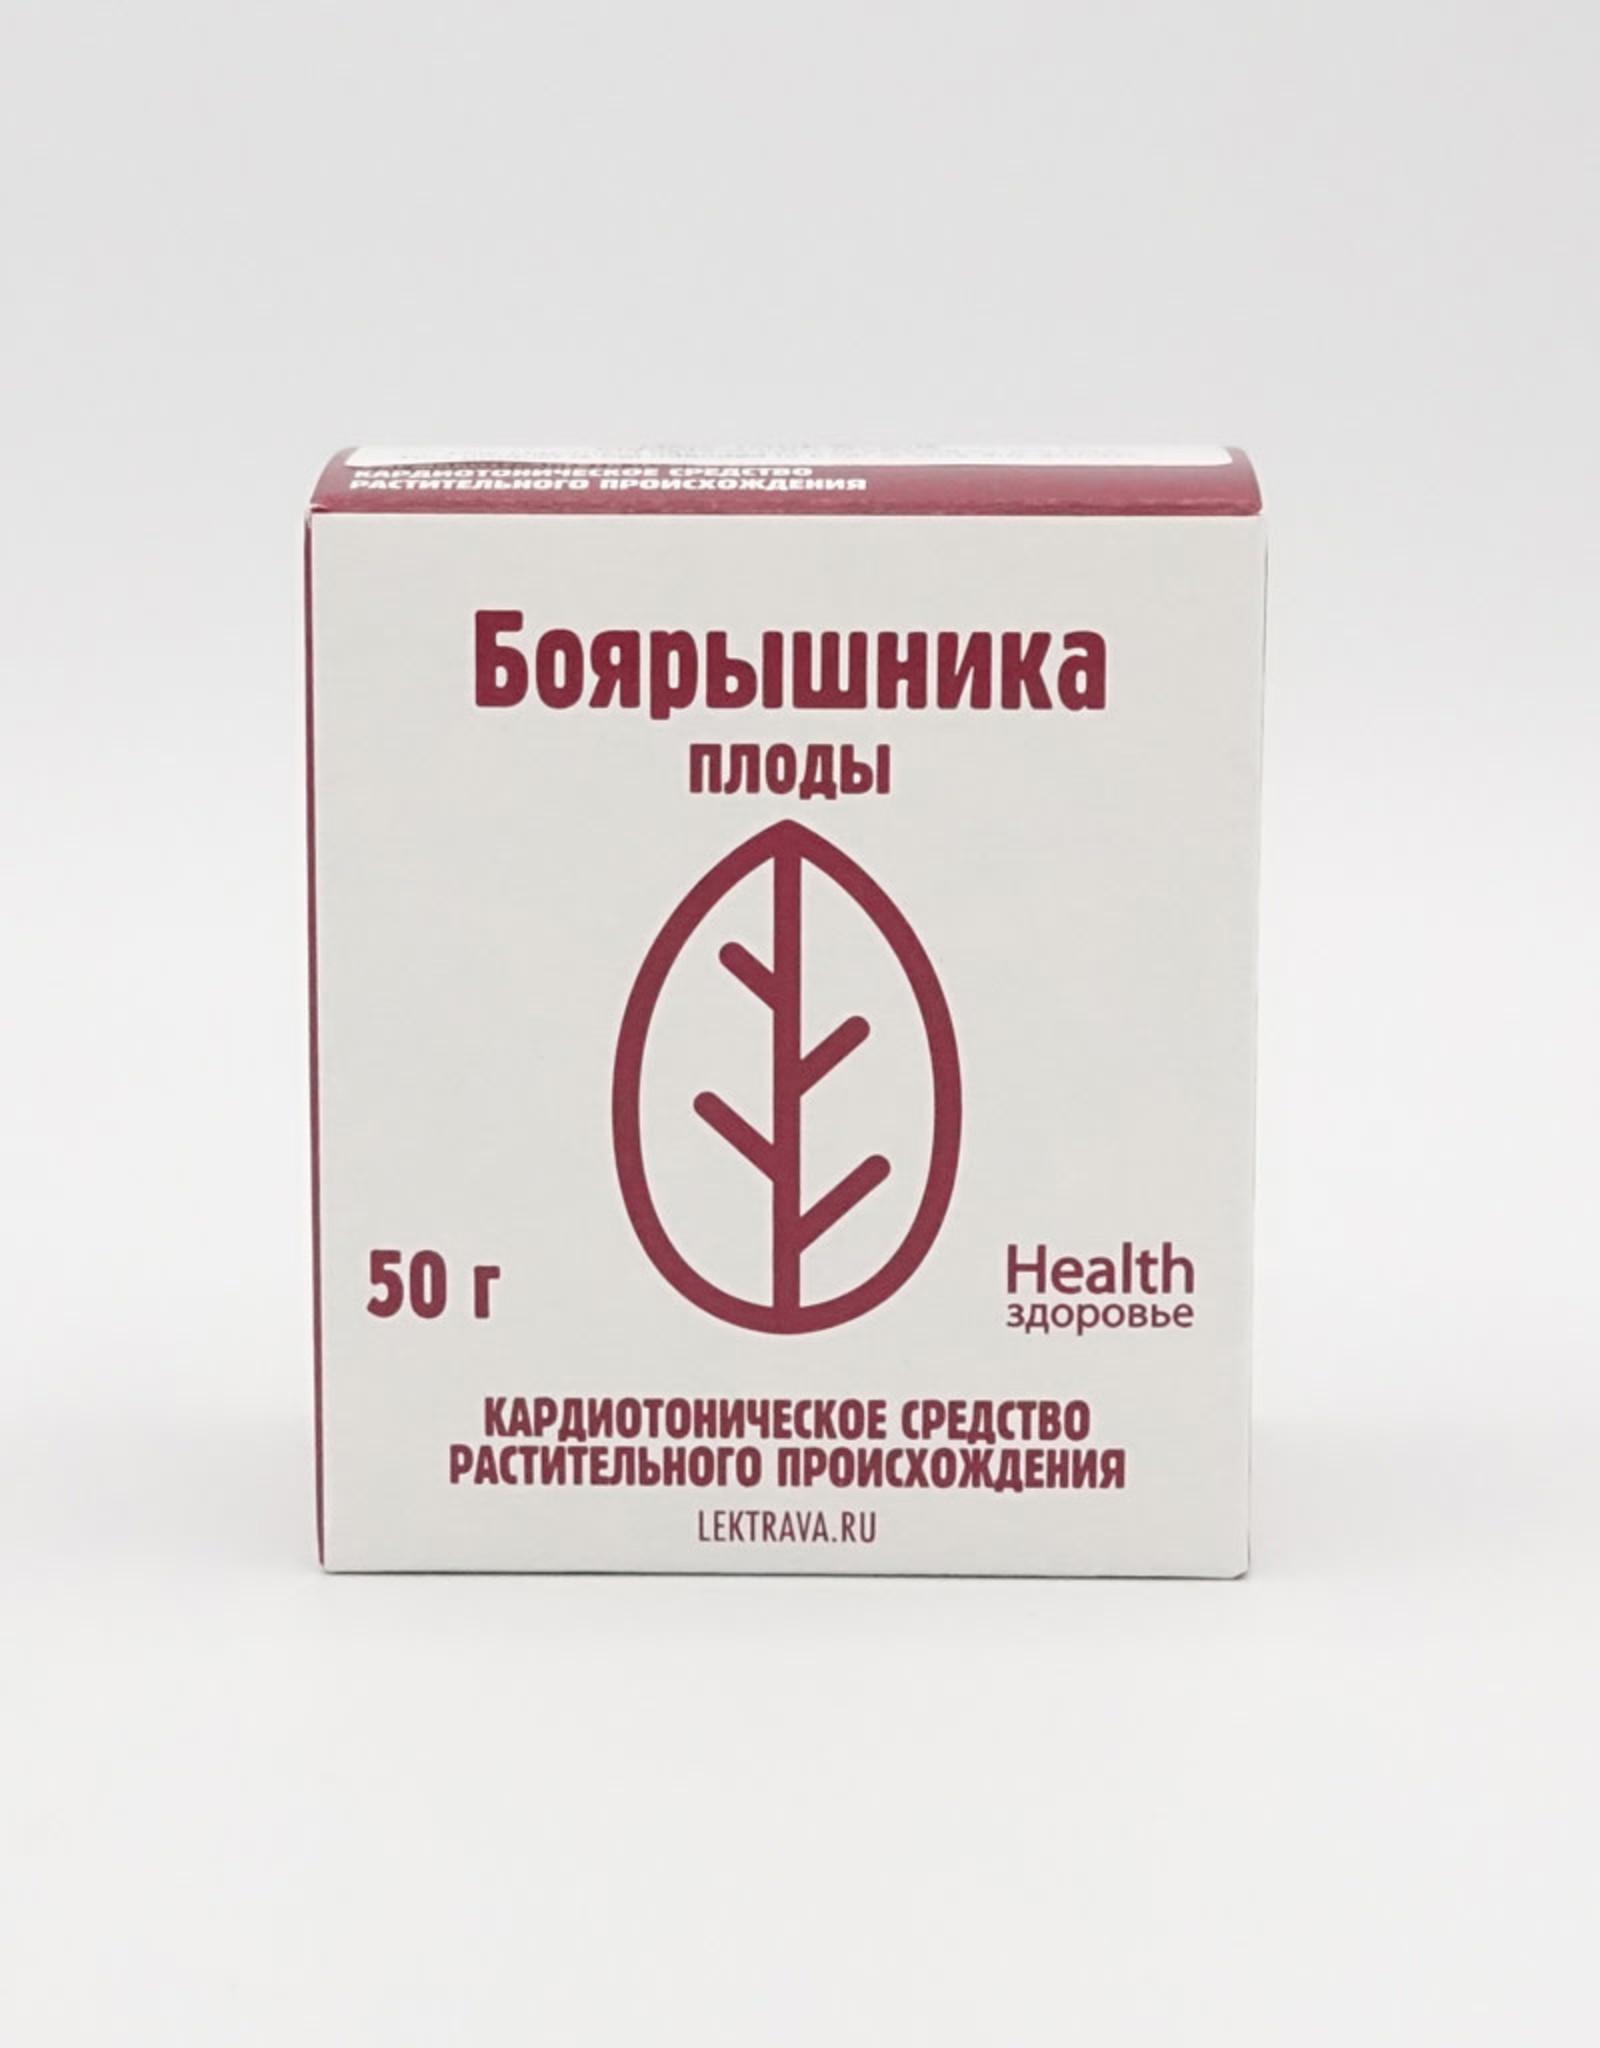 Health, Здоровье Боярышника Плоды